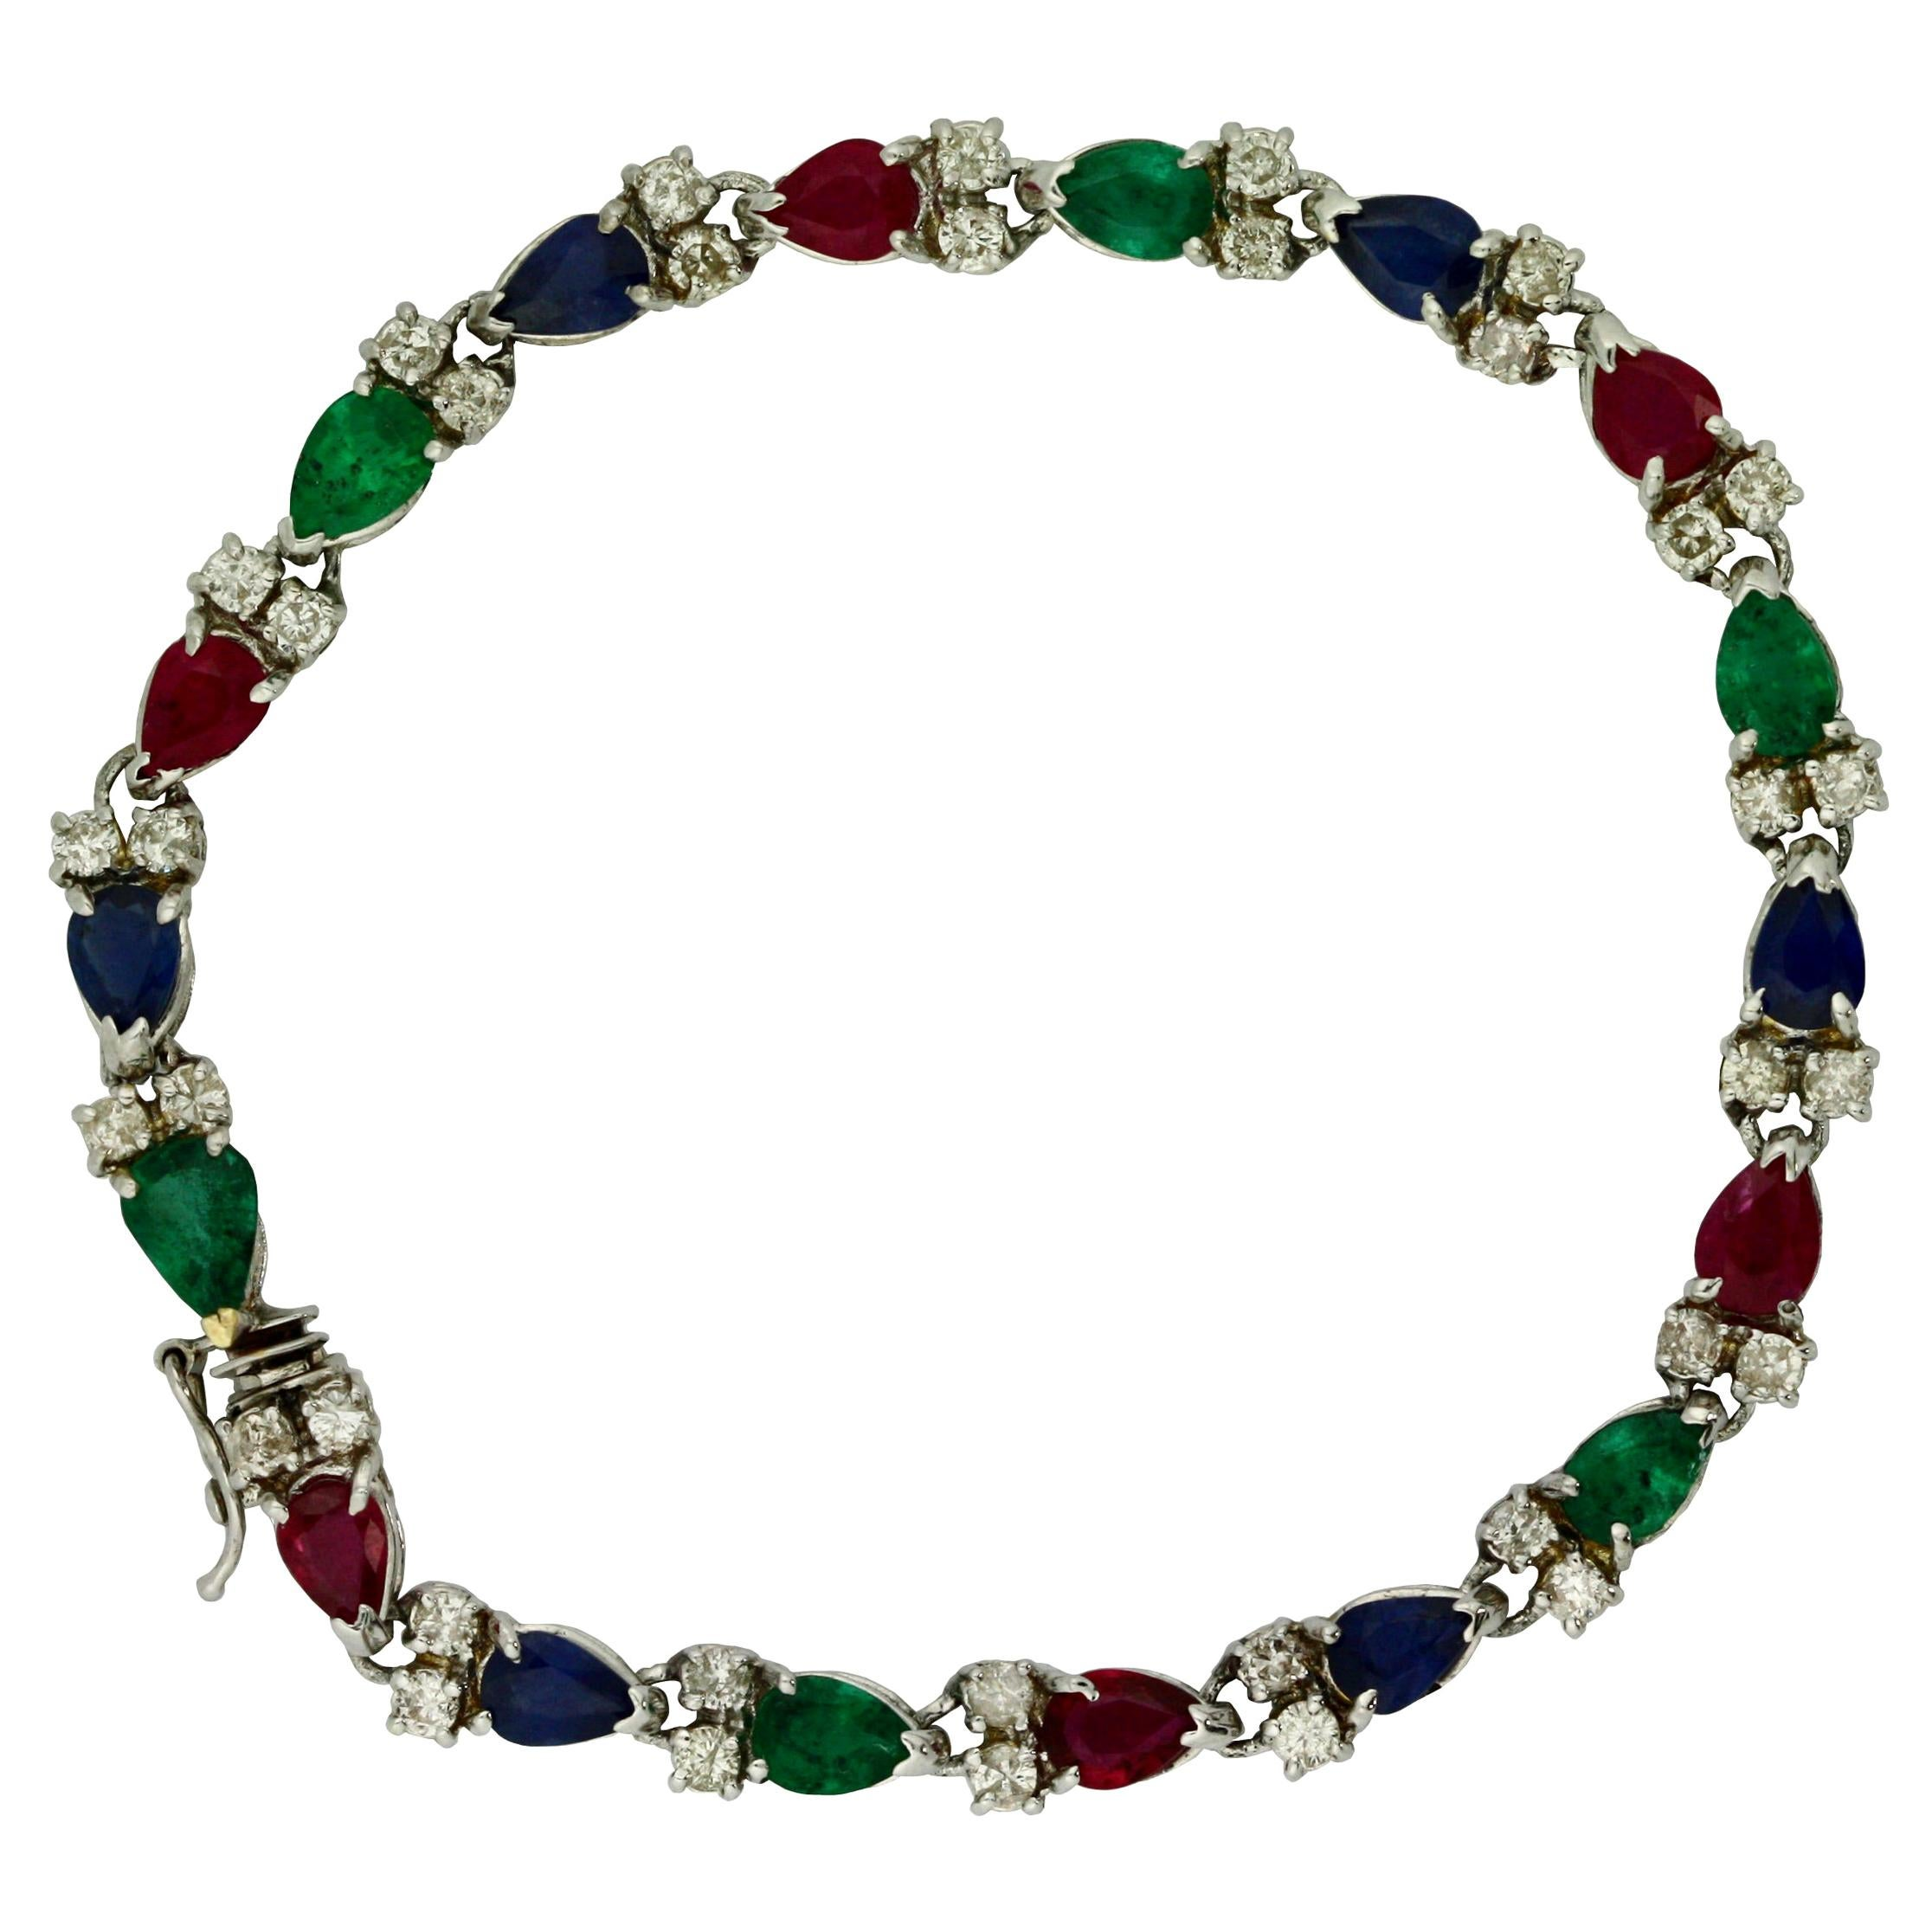 Sapphire, Ruby, Emerald and Diamond Bracelet